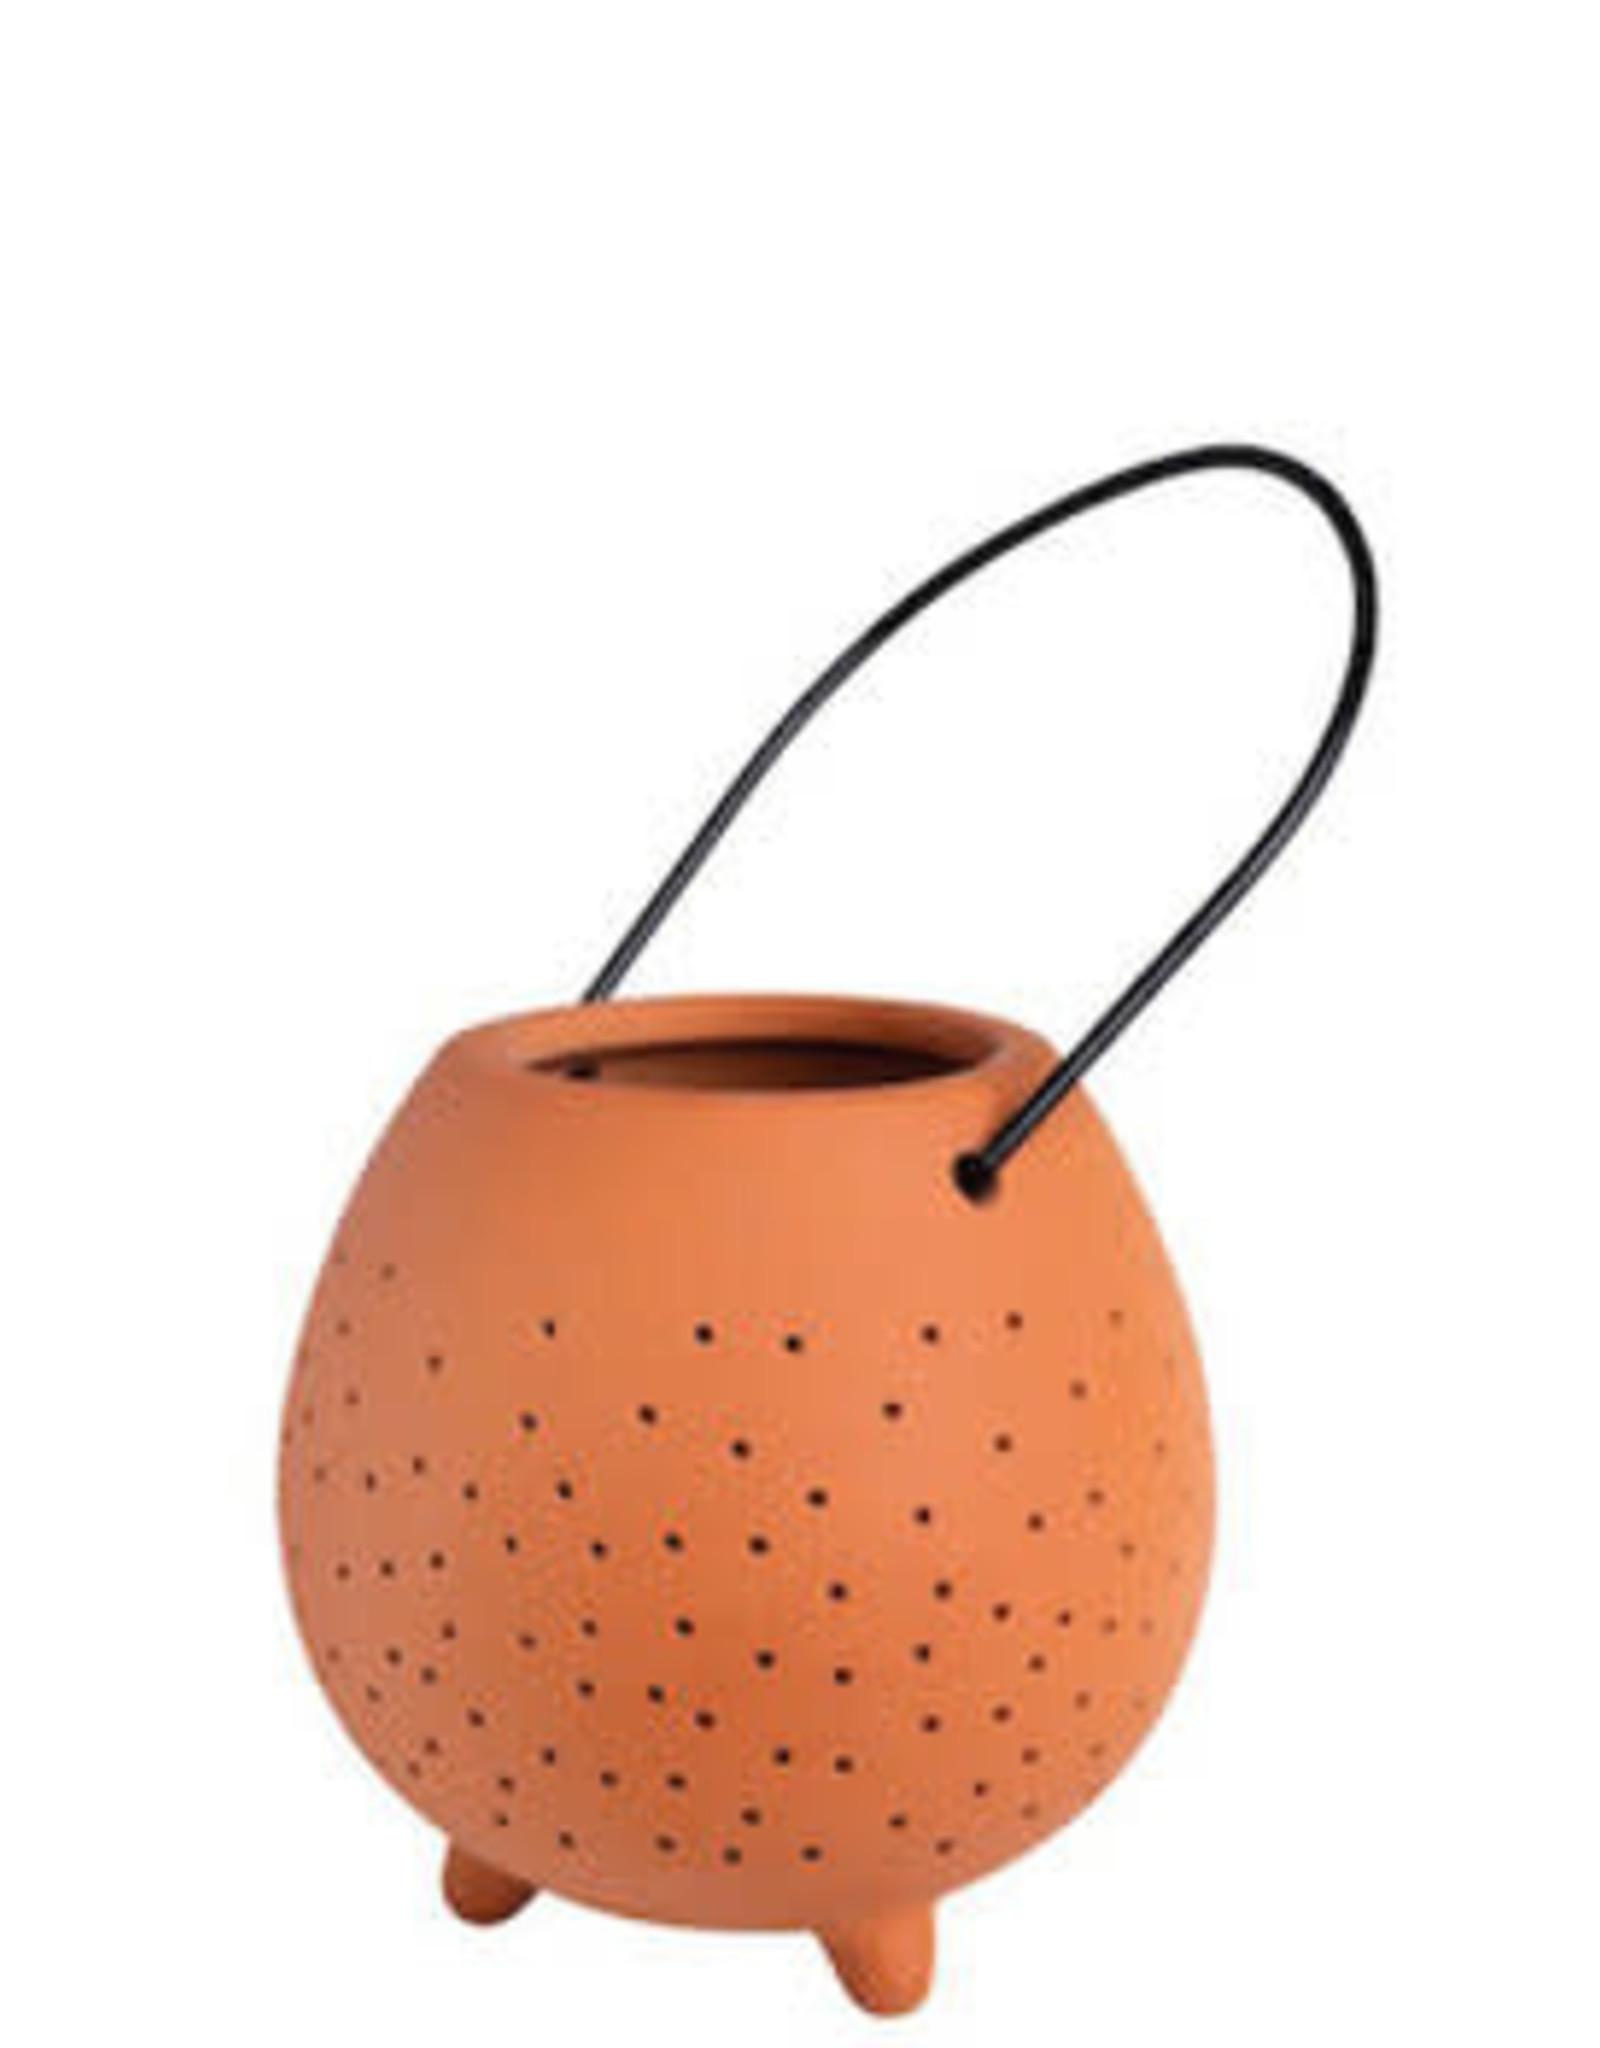 Räder Räder - Outdoor terracotta lantern - small